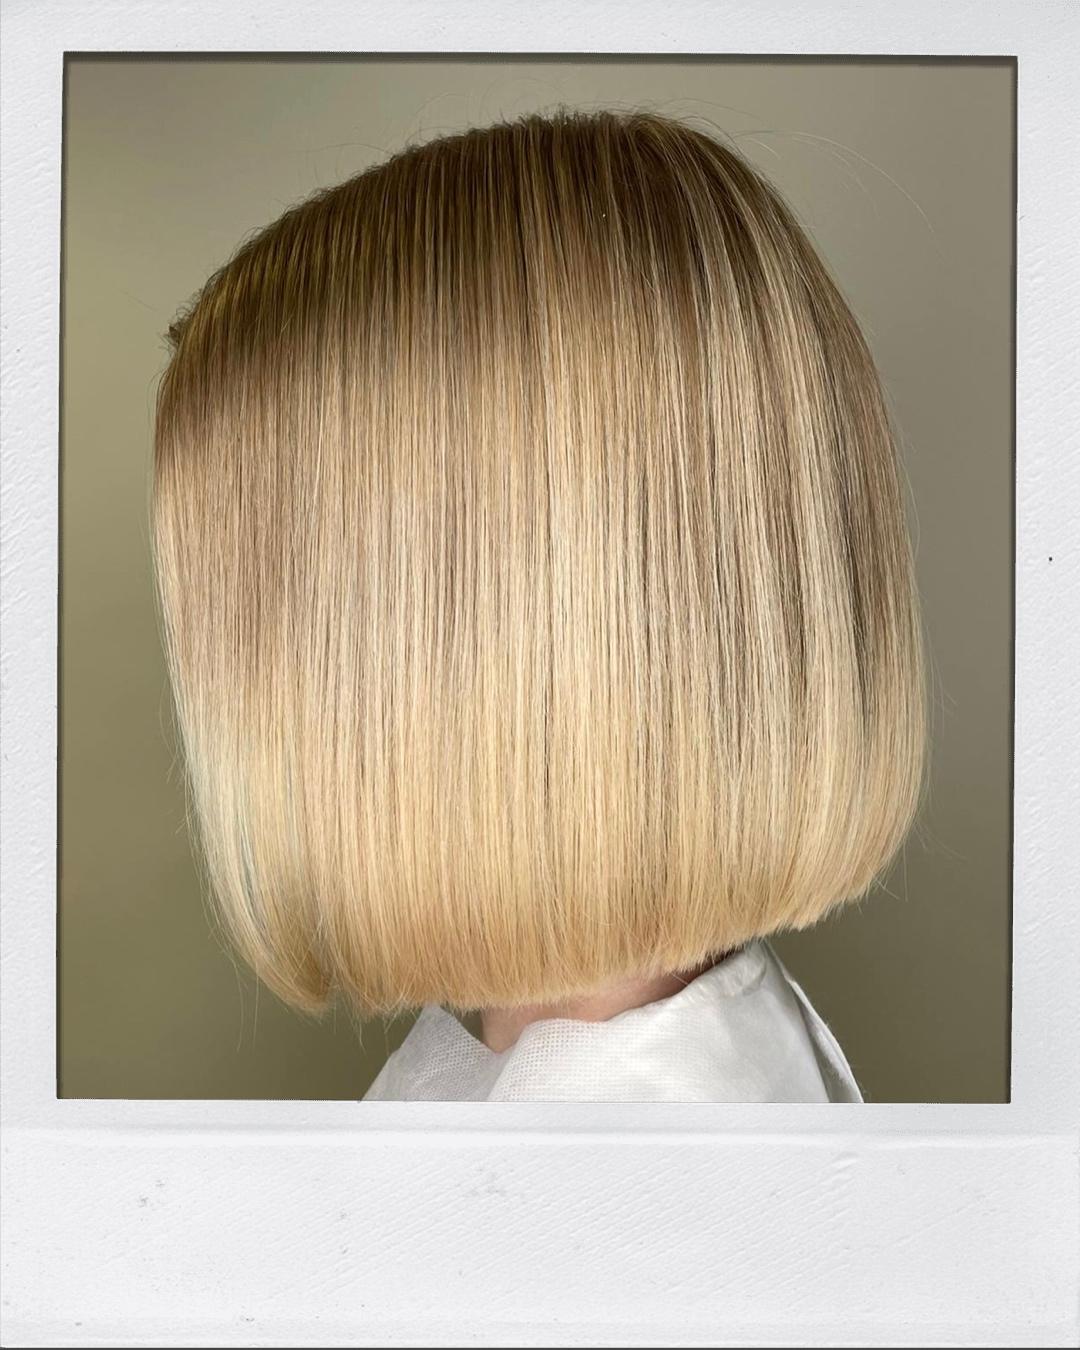 balayage_week_toni&guy_preguntas_respuestas_hairstyle_blonde_hair_4